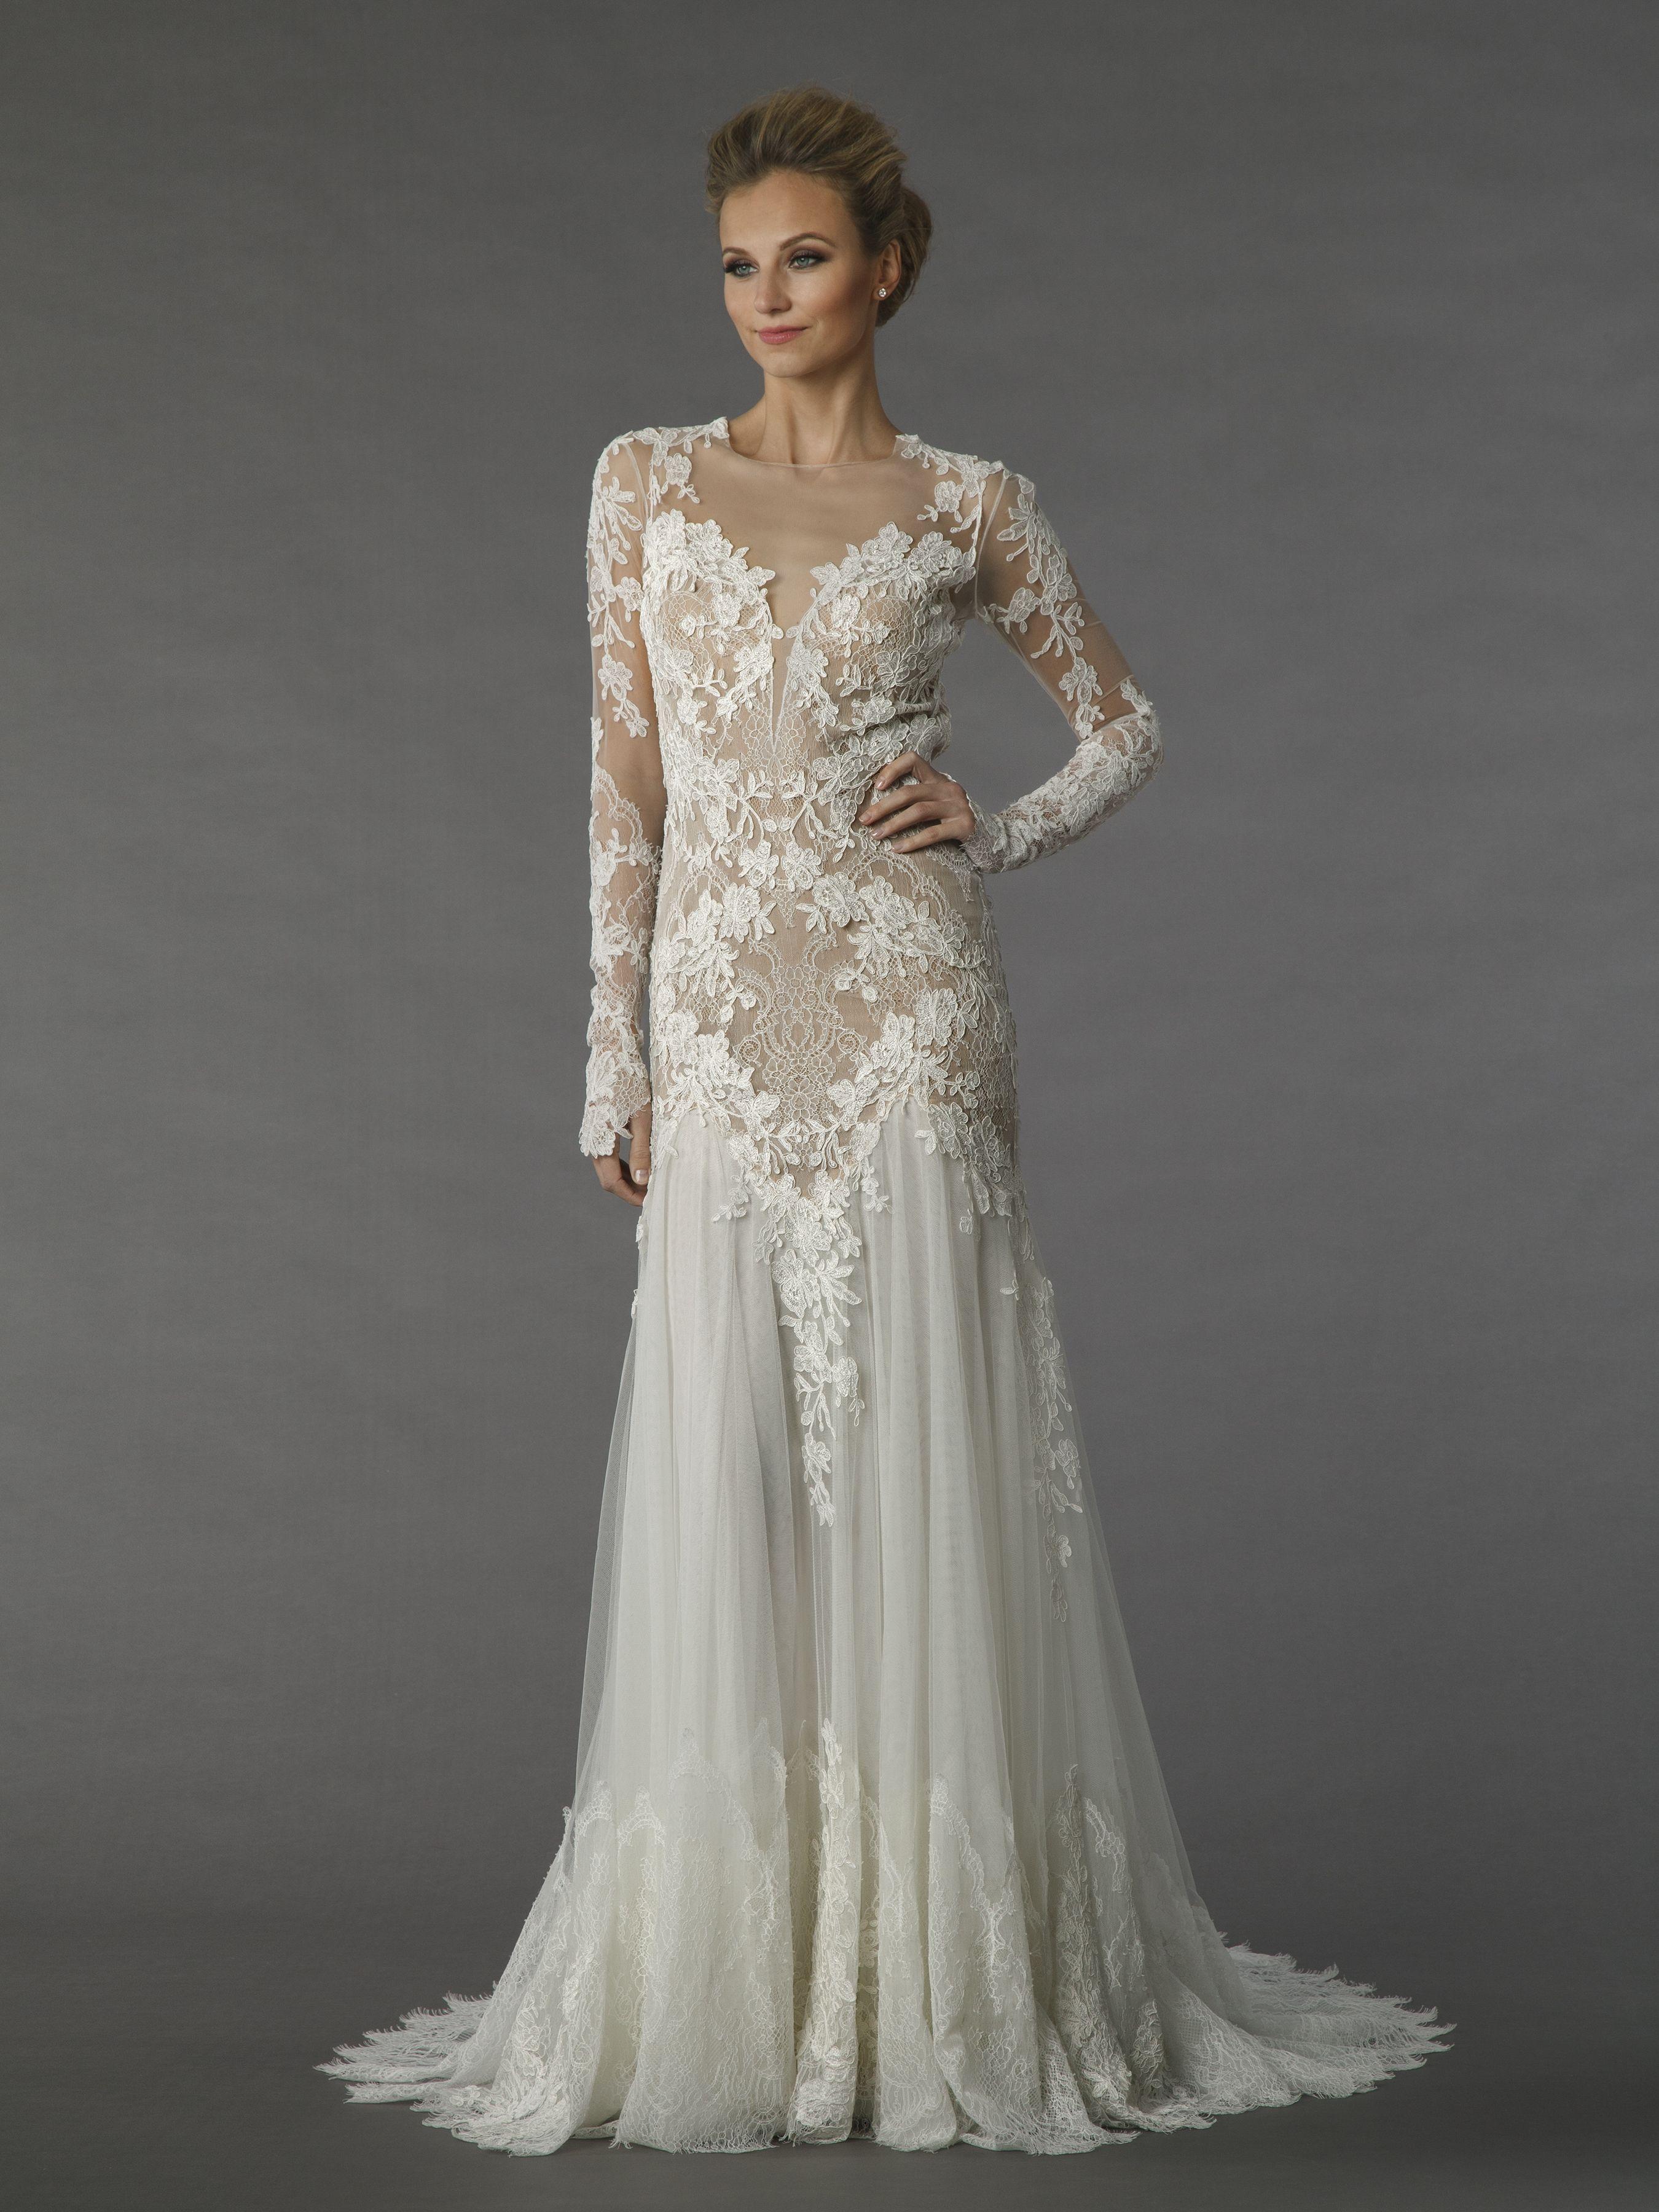 e5c27b7b94d Long sleeve illusion lace wedding dress.